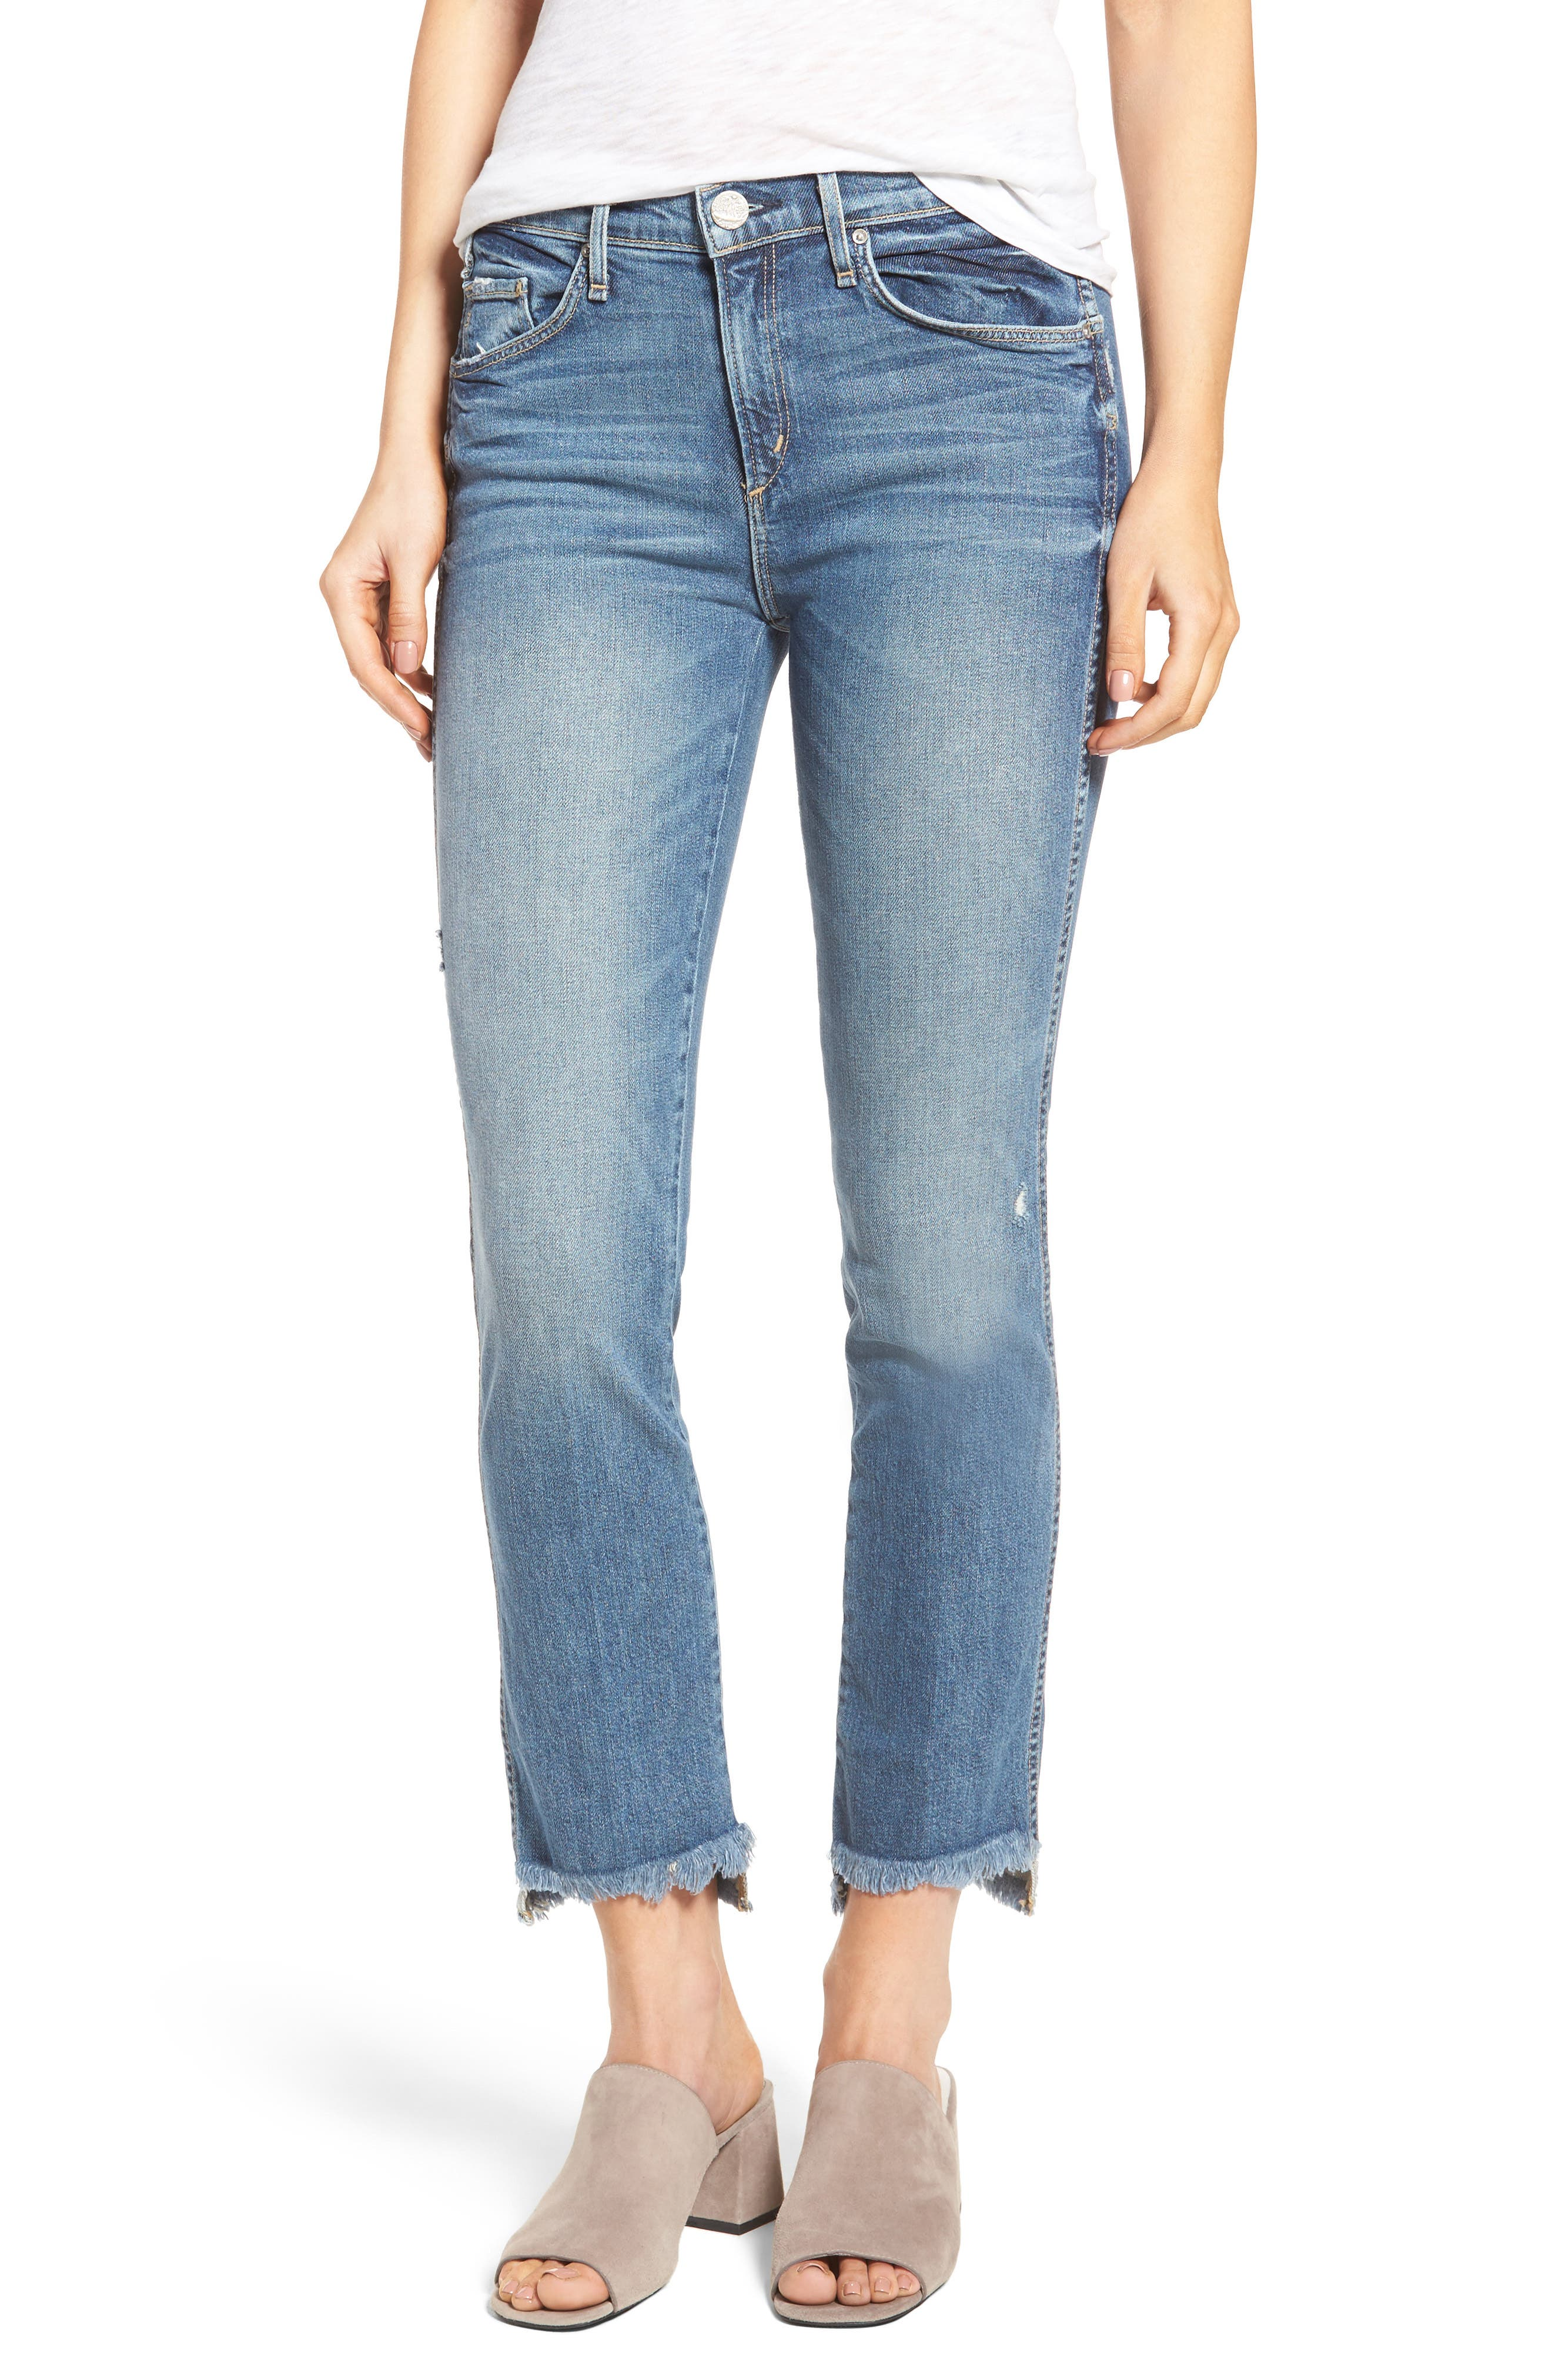 McGuire Lido Frayed Crop Straight Leg Jeans (Beatriz)